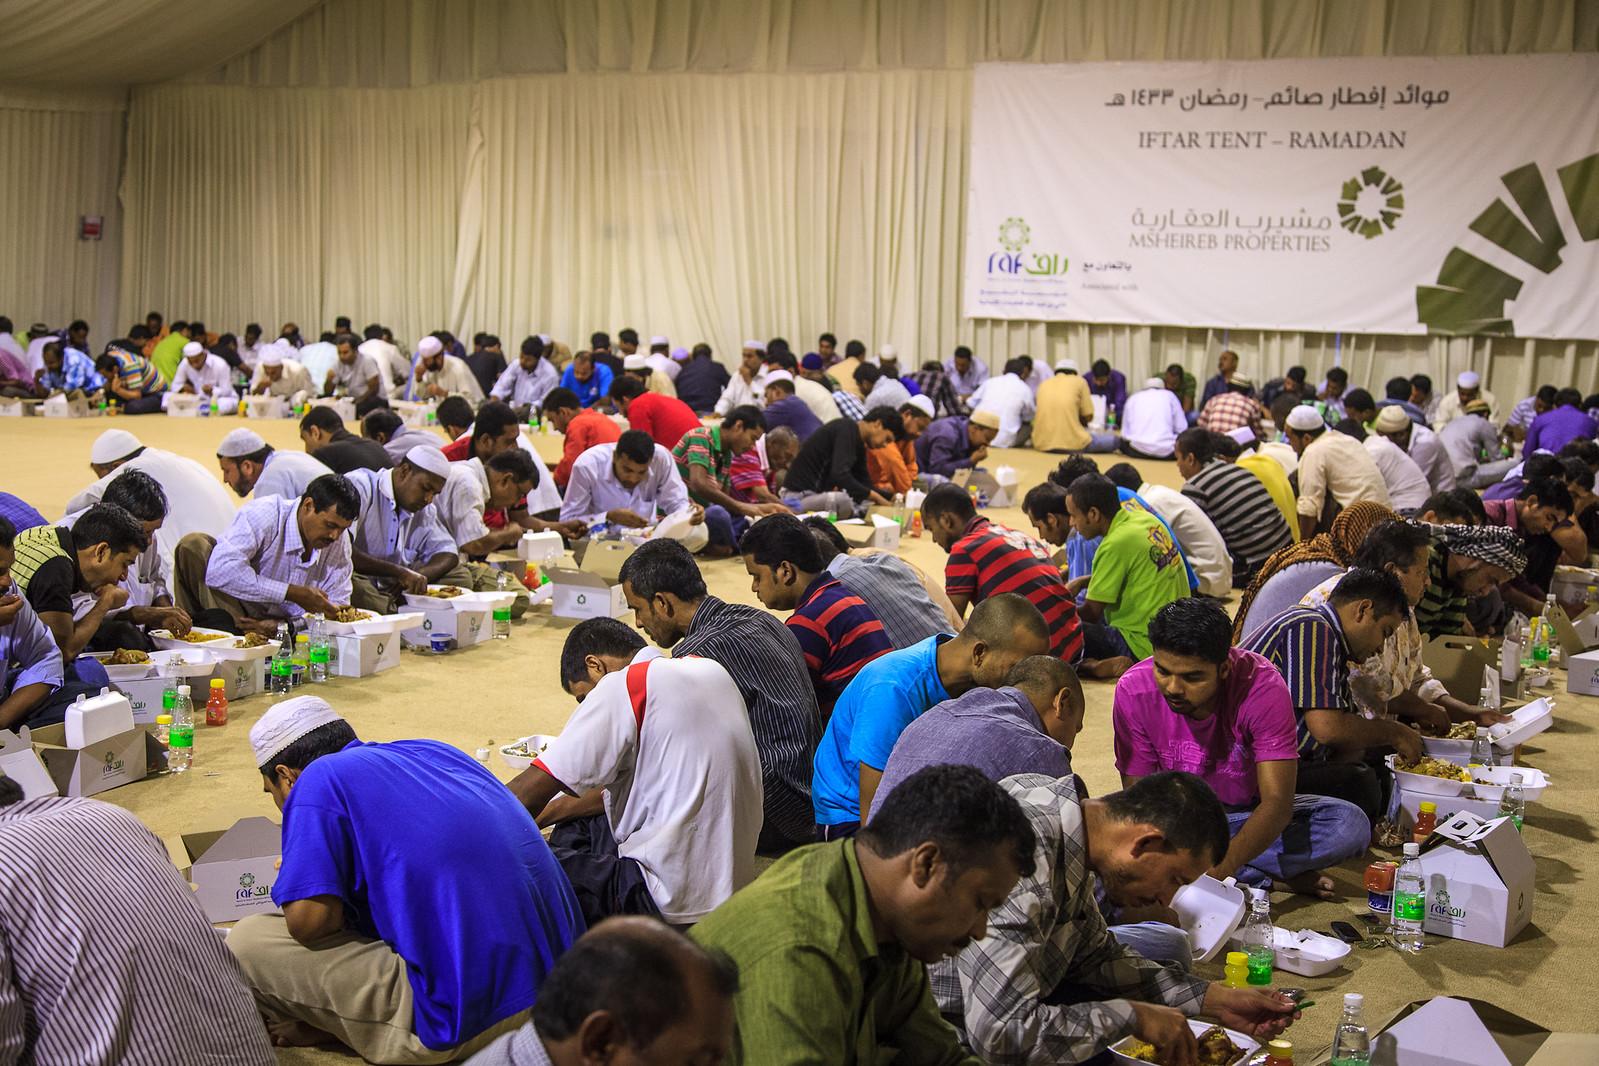 Inside a Ramadan tent